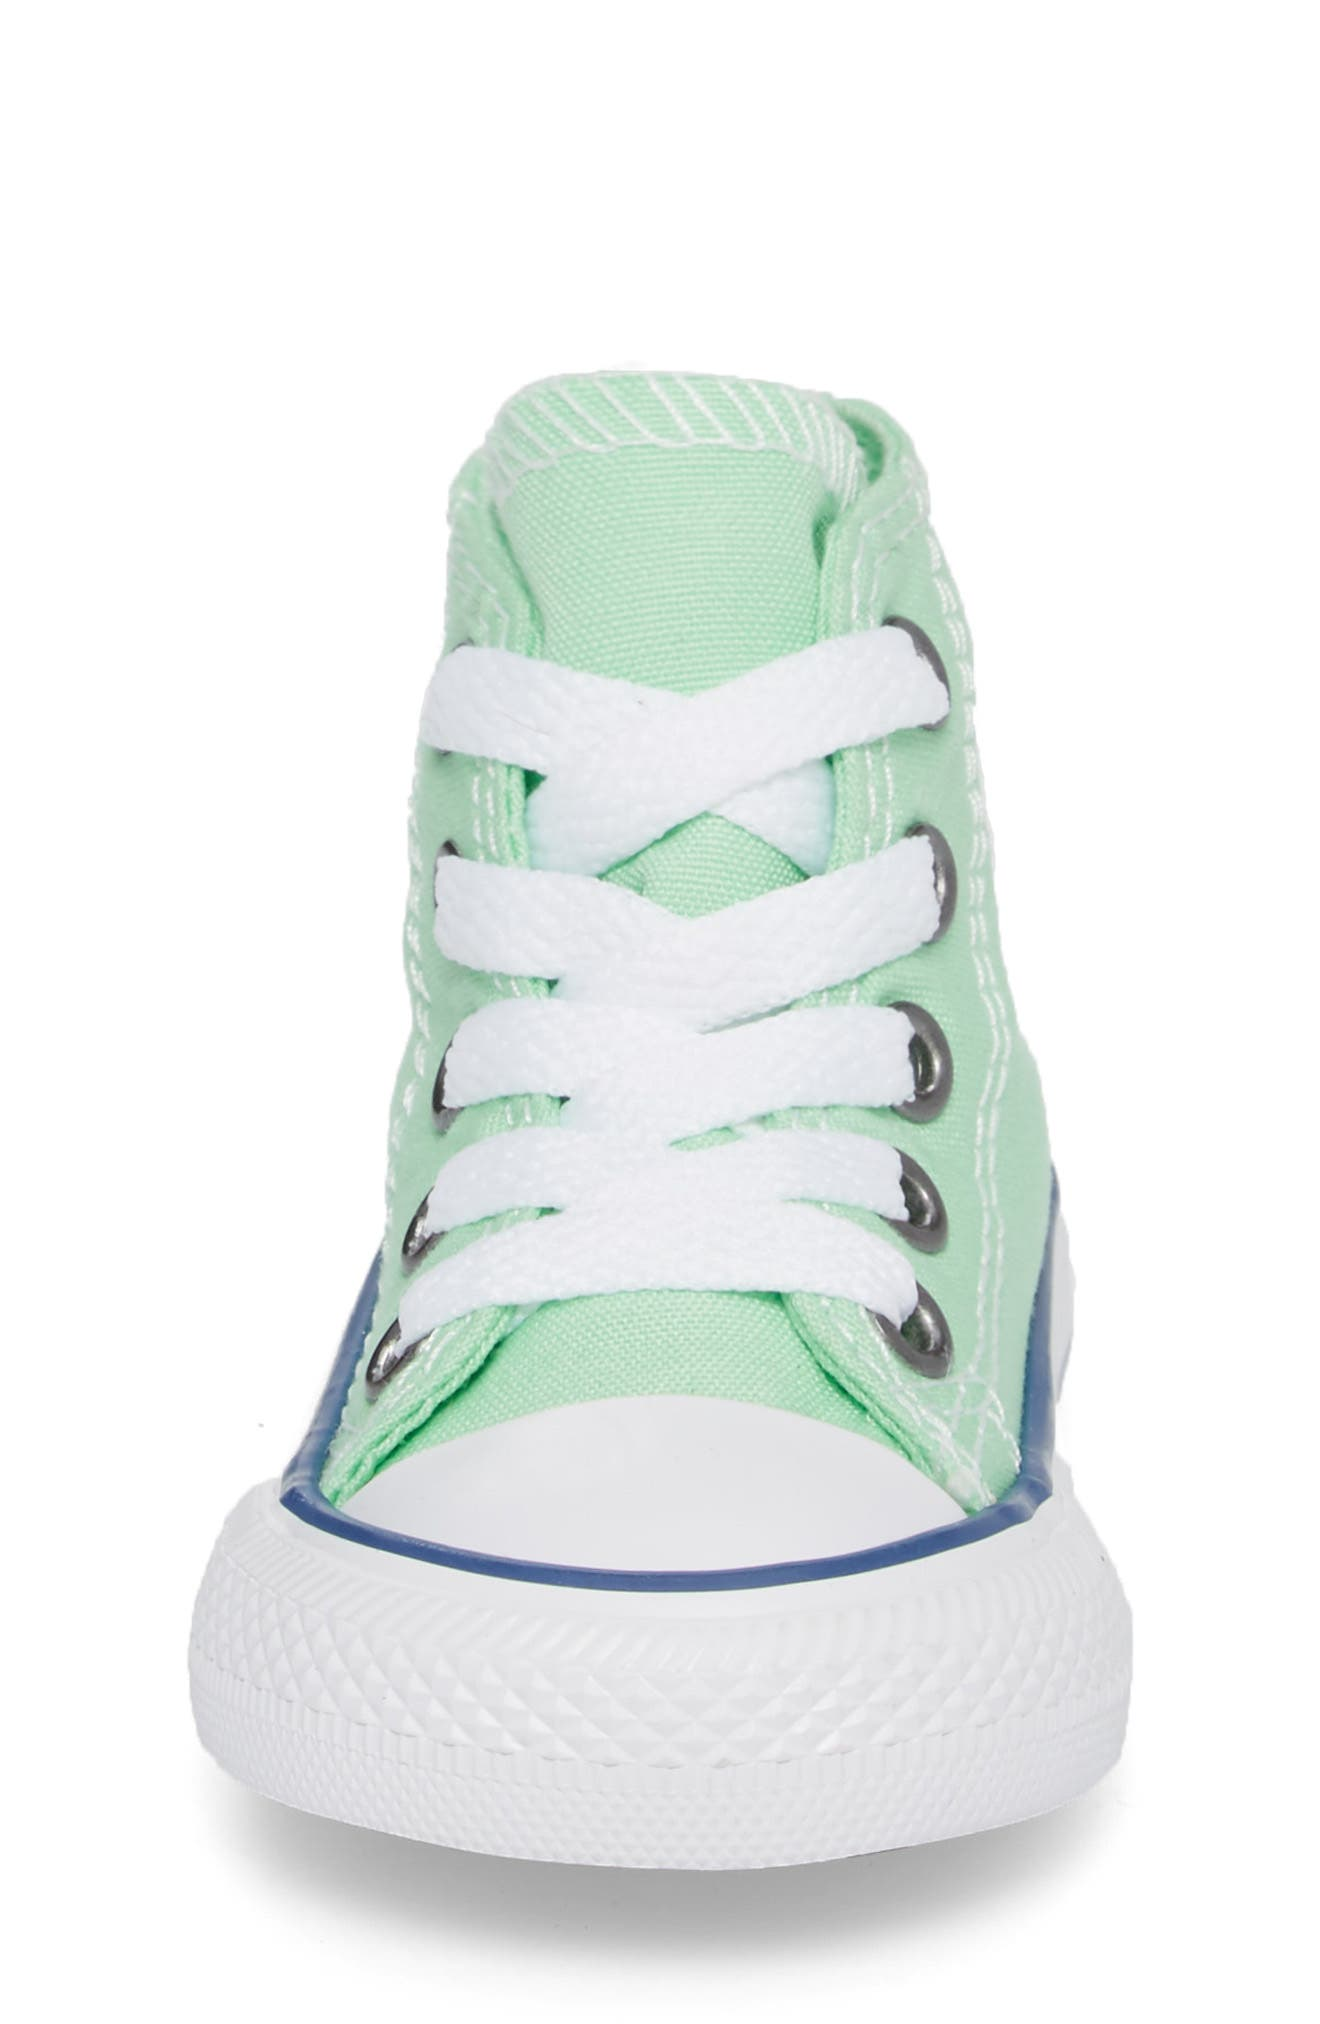 Chuck Taylor<sup>®</sup> All Star<sup>®</sup> Seasonal High Top Sneaker,                             Alternate thumbnail 4, color,                             336